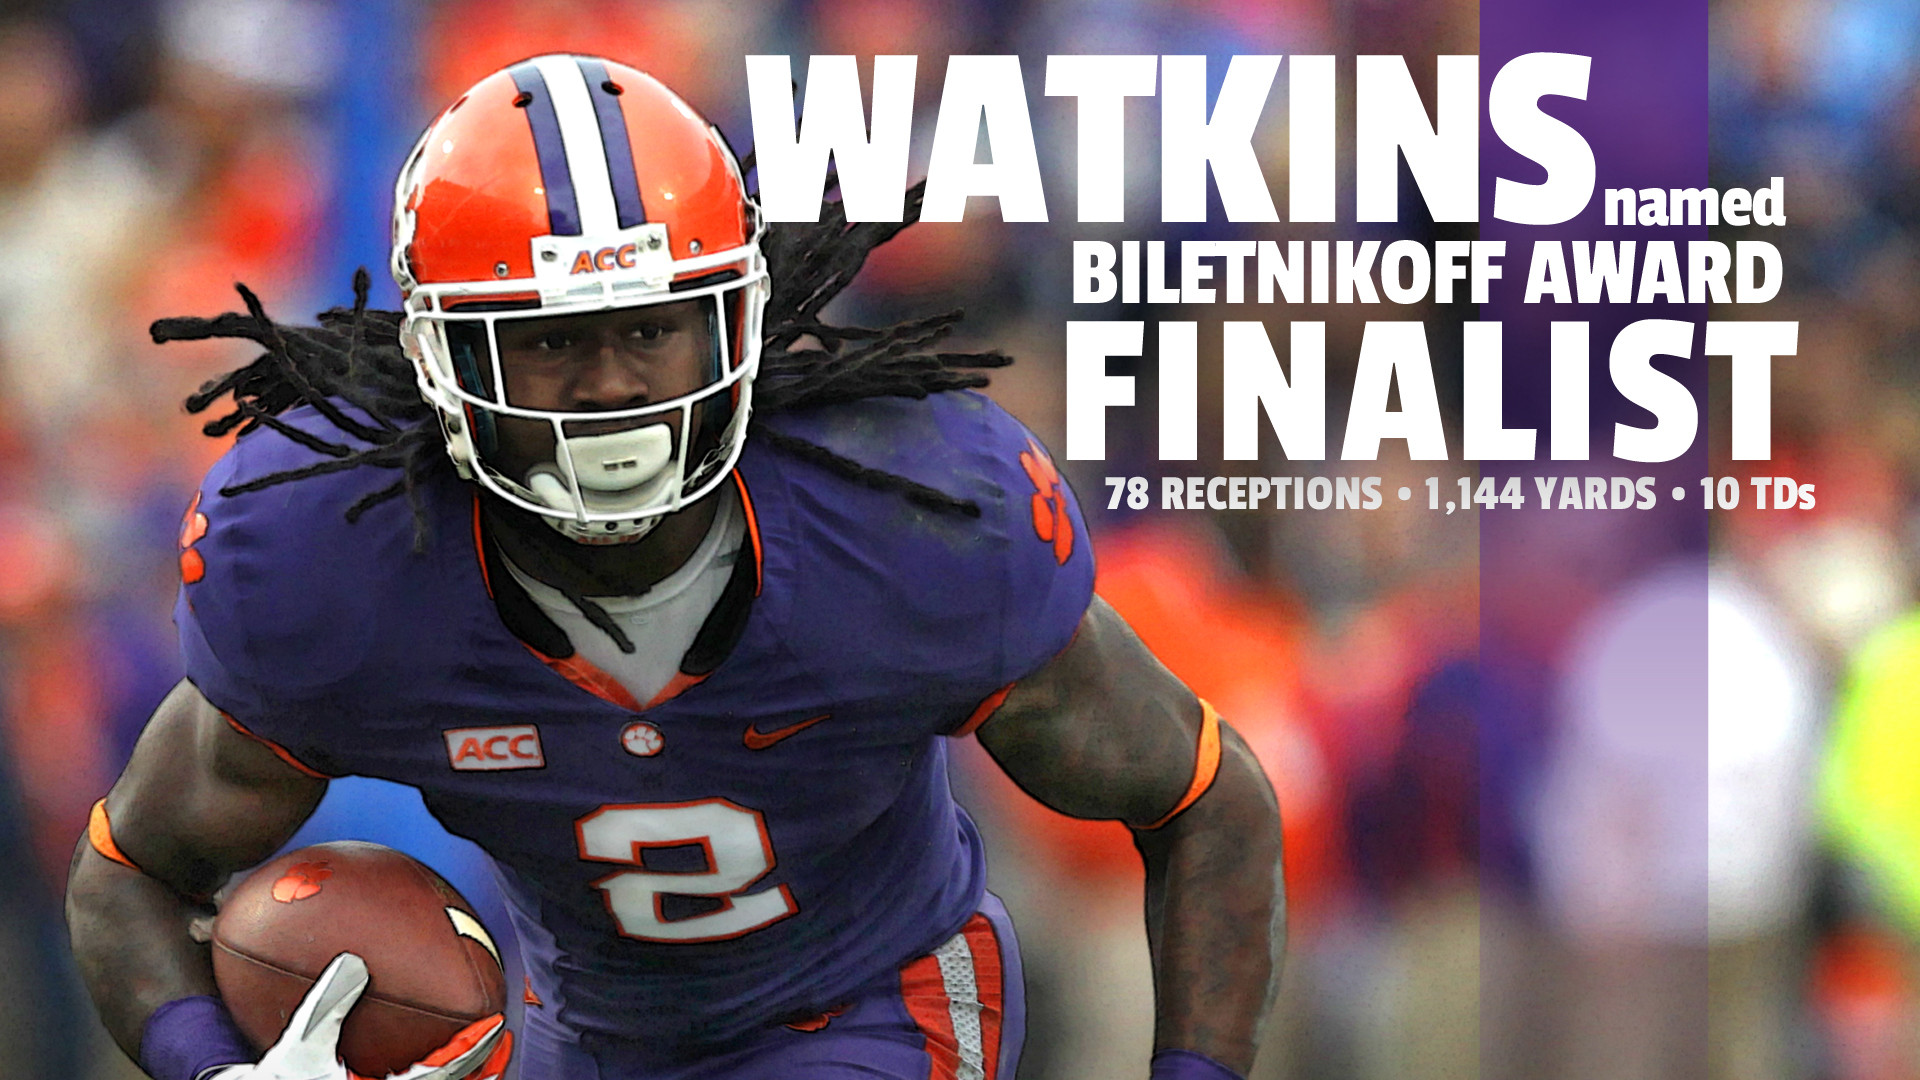 Watkins Finalist for Biletnikoff Award